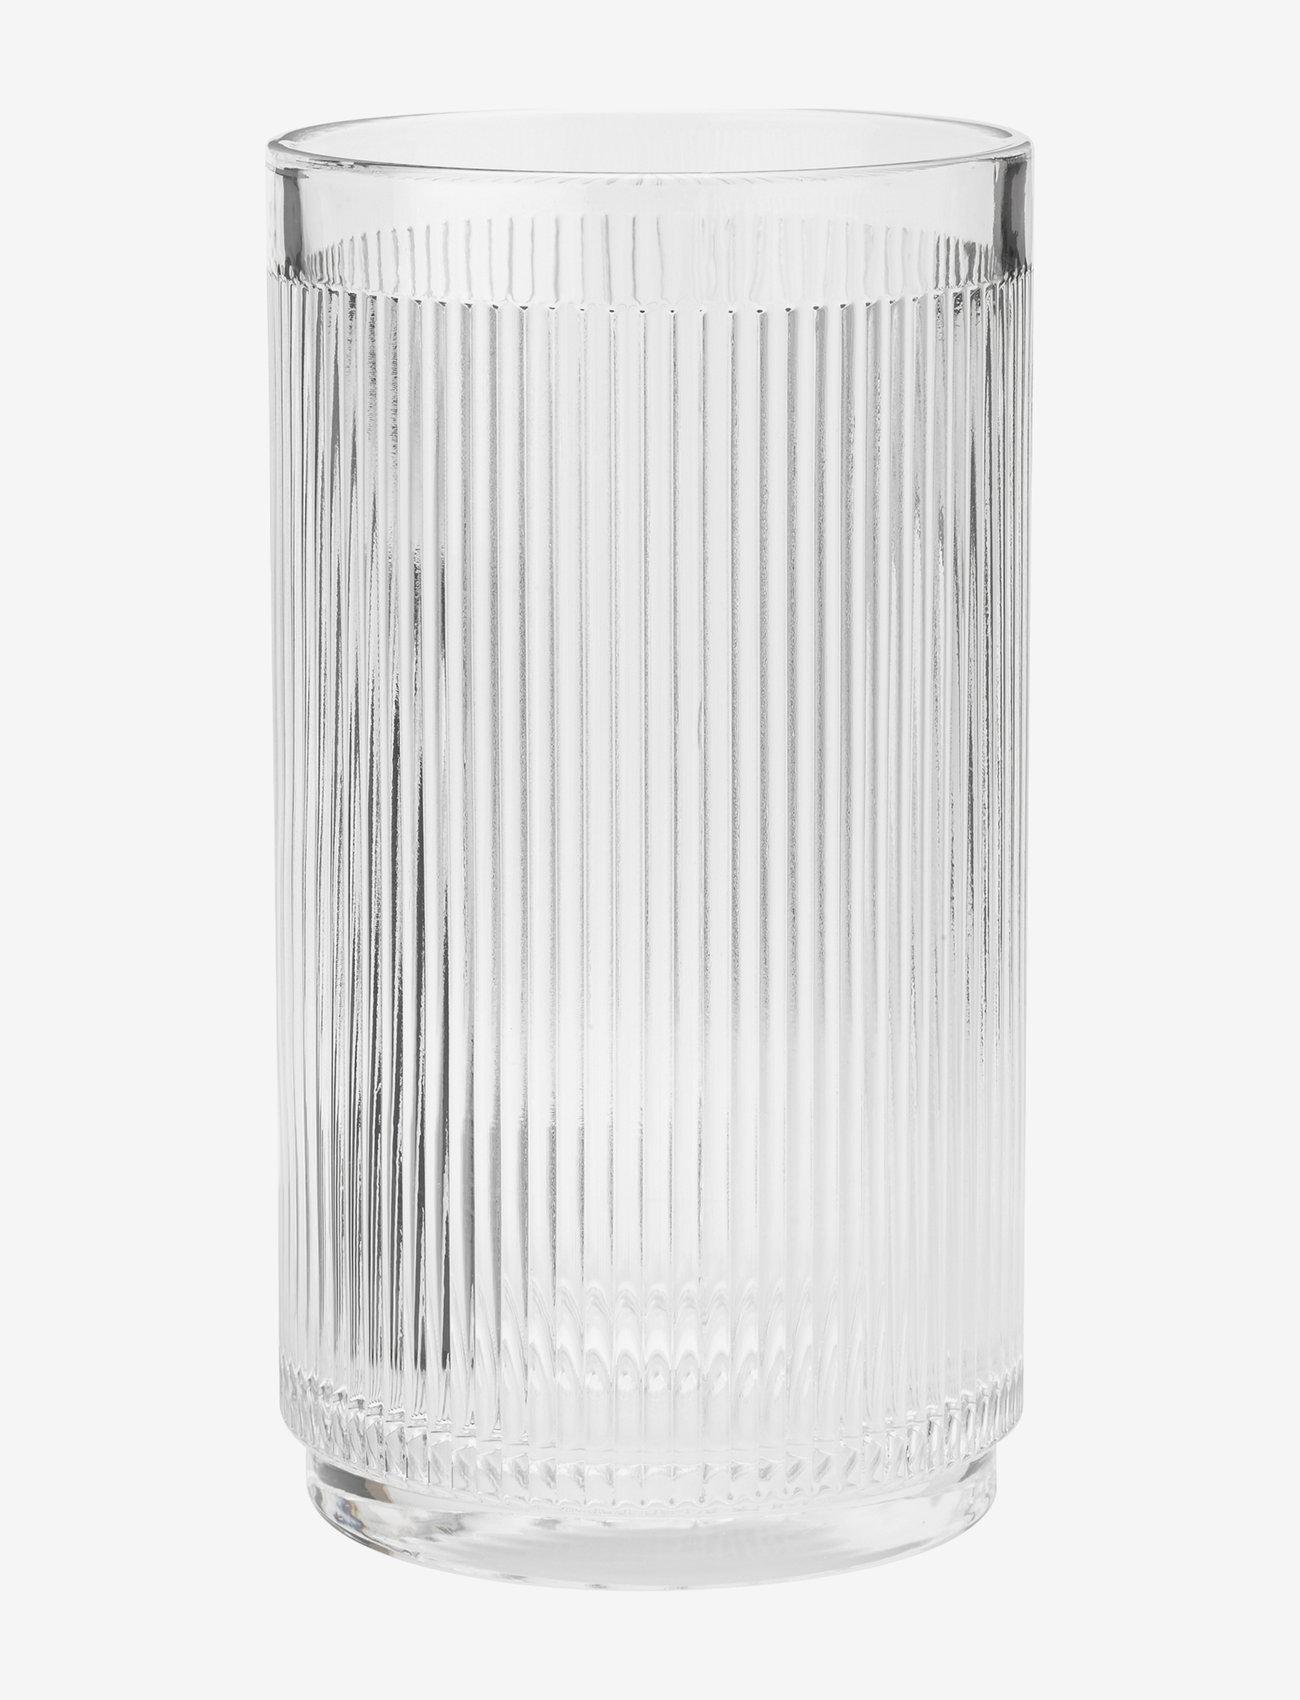 Stelton - Pilastro wine cooler - no color - 1